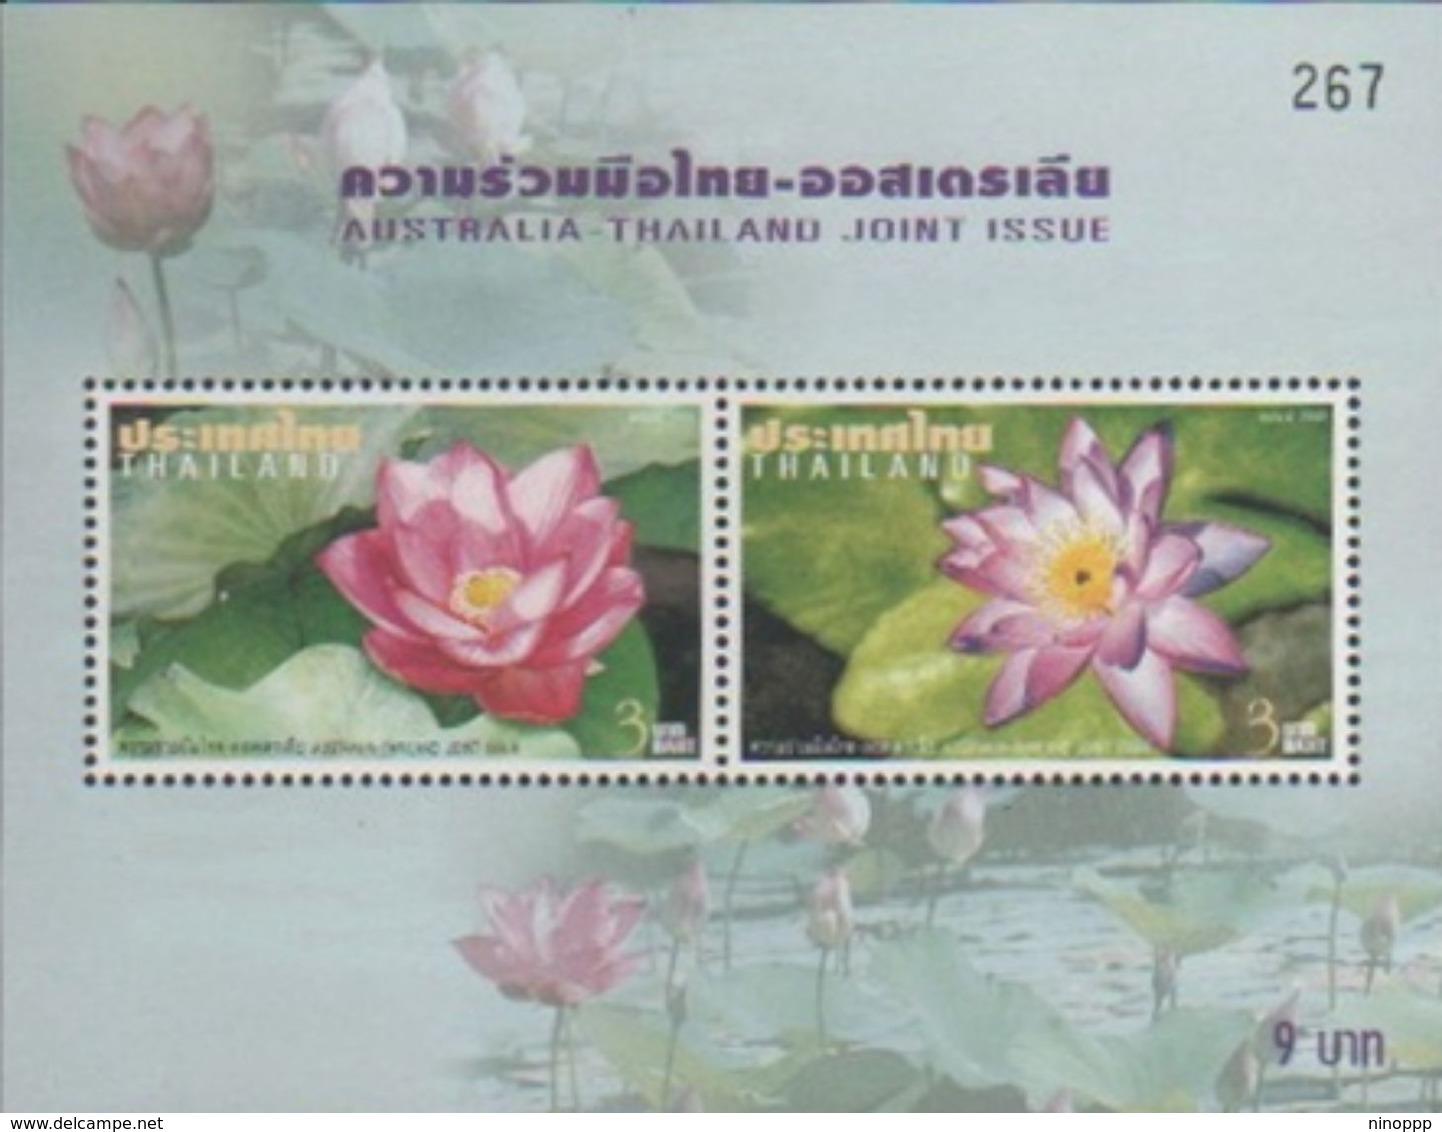 Thailand 2002 Joint Issue With Australia Souvenir Sheet MNH - Thailand